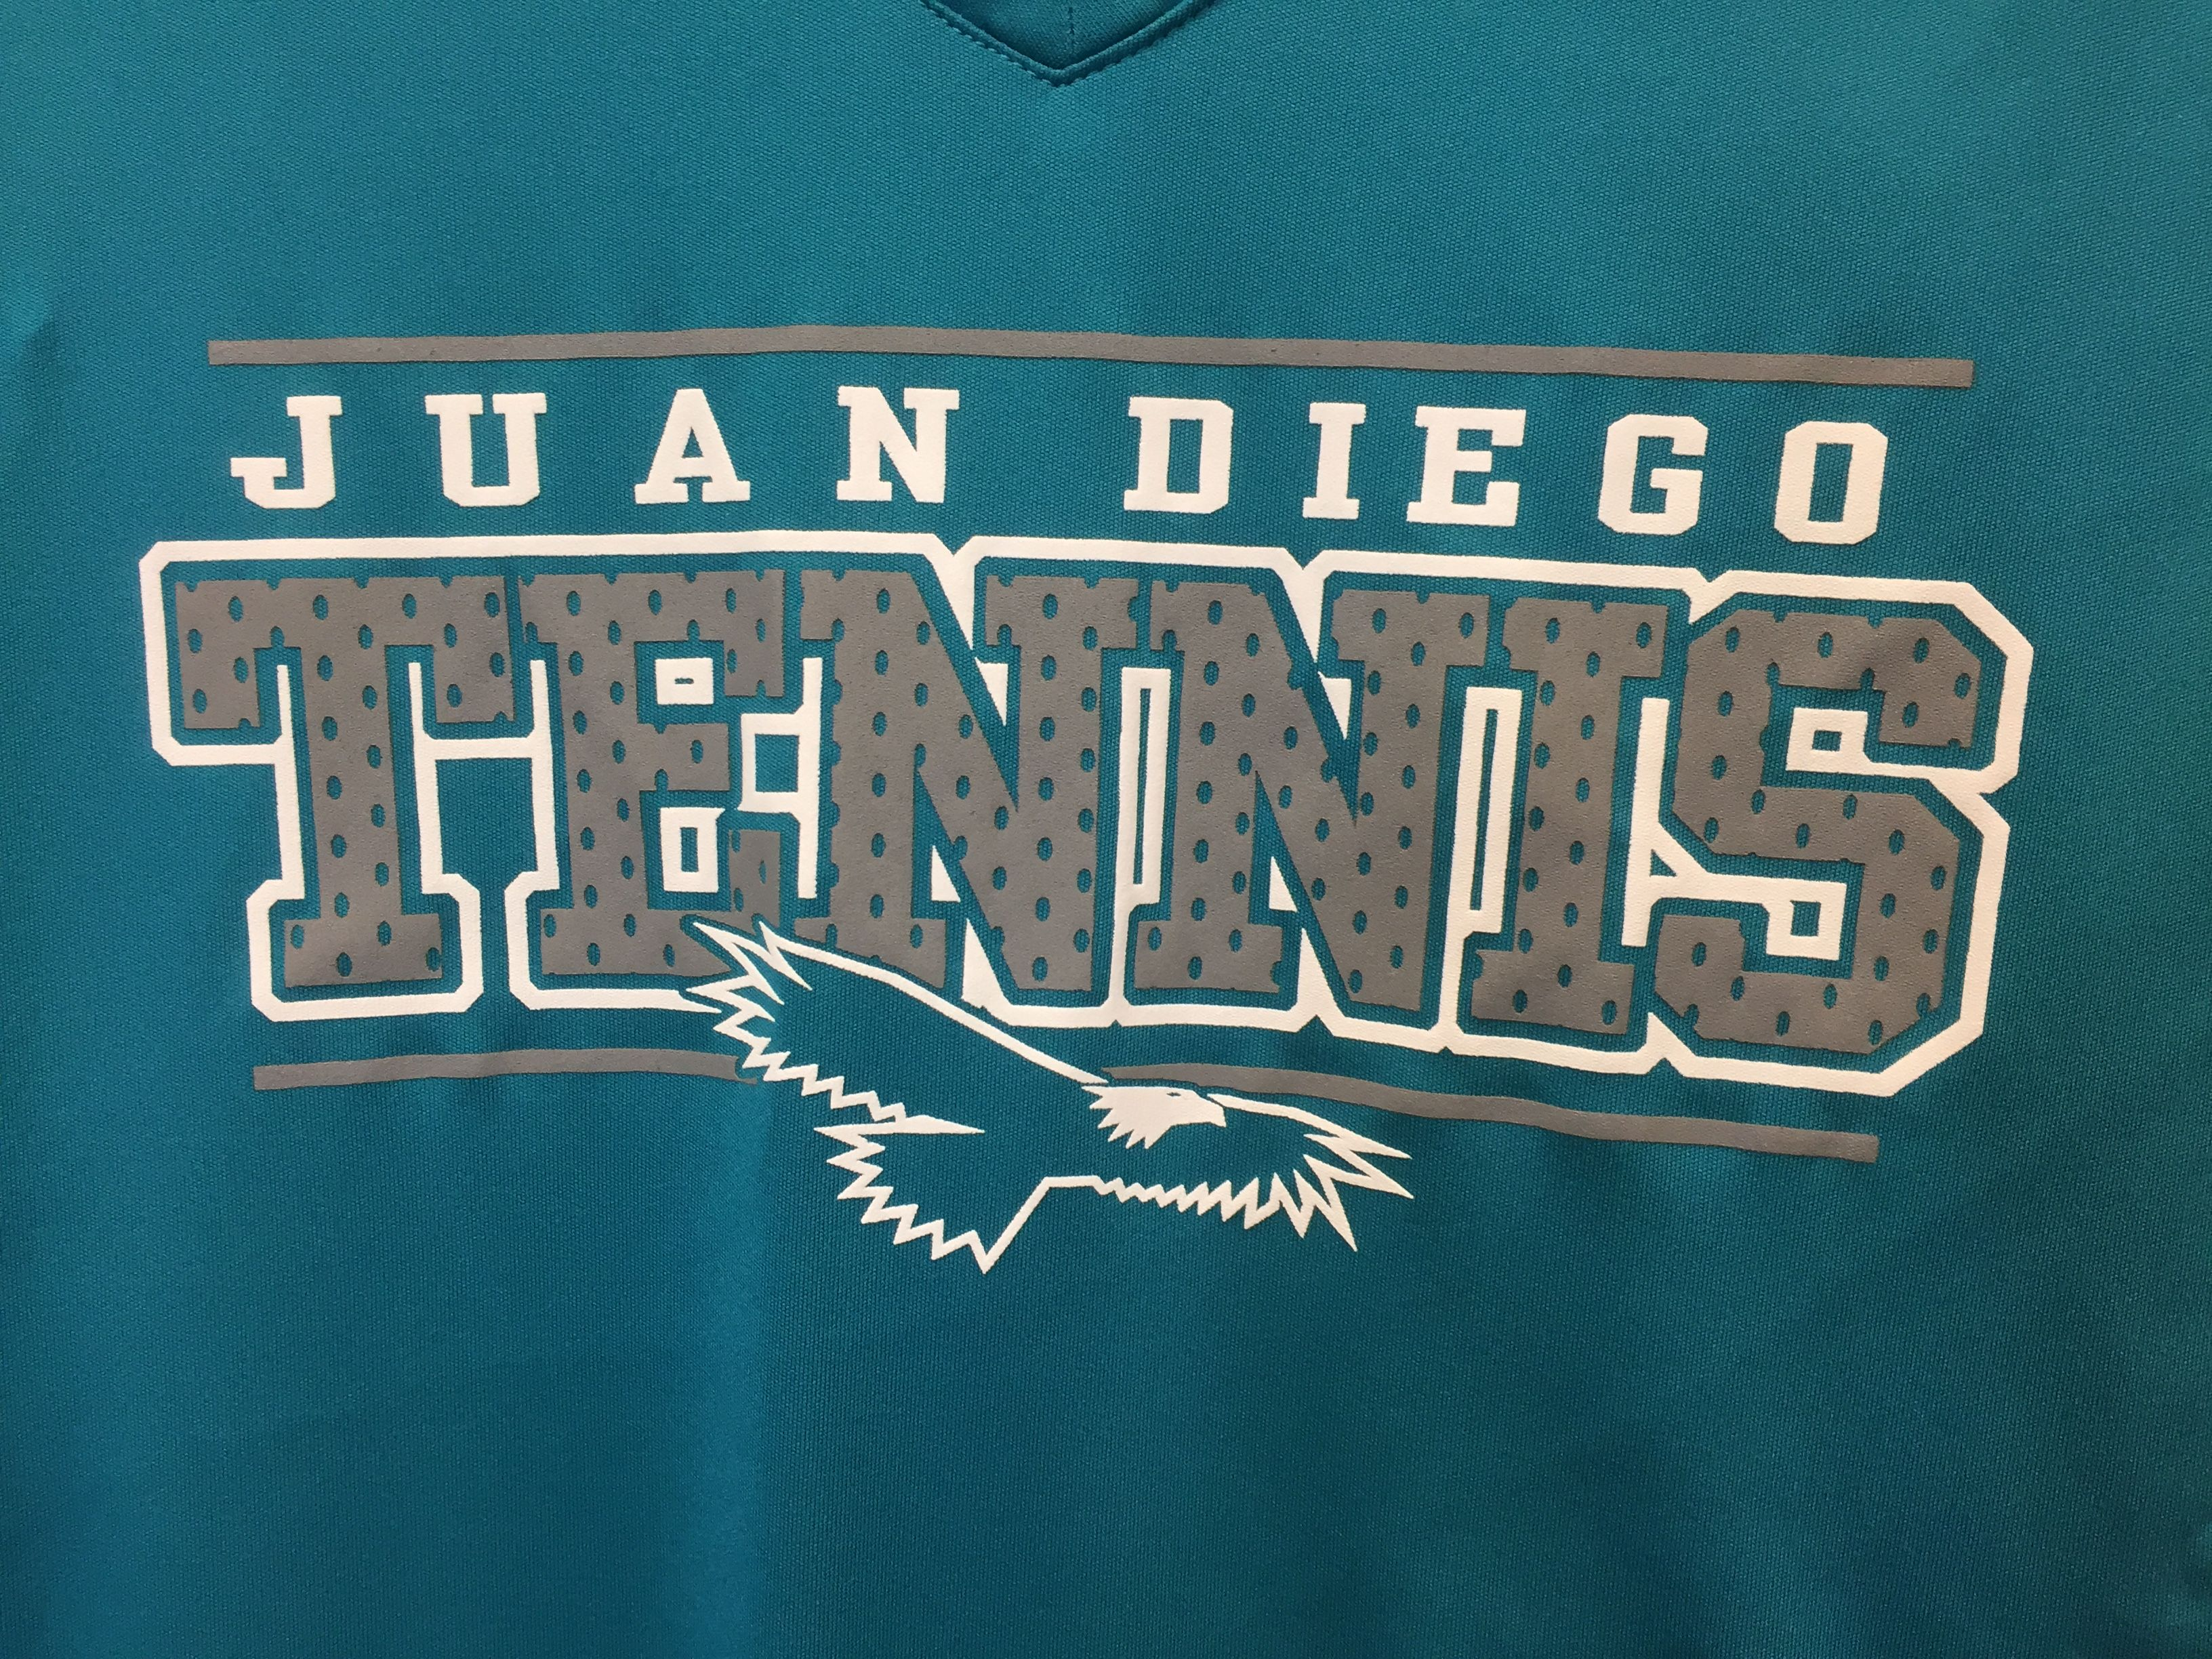 Shirt hoodie design - Tennis T Shirt And Hoodie Design Idea High School Sports